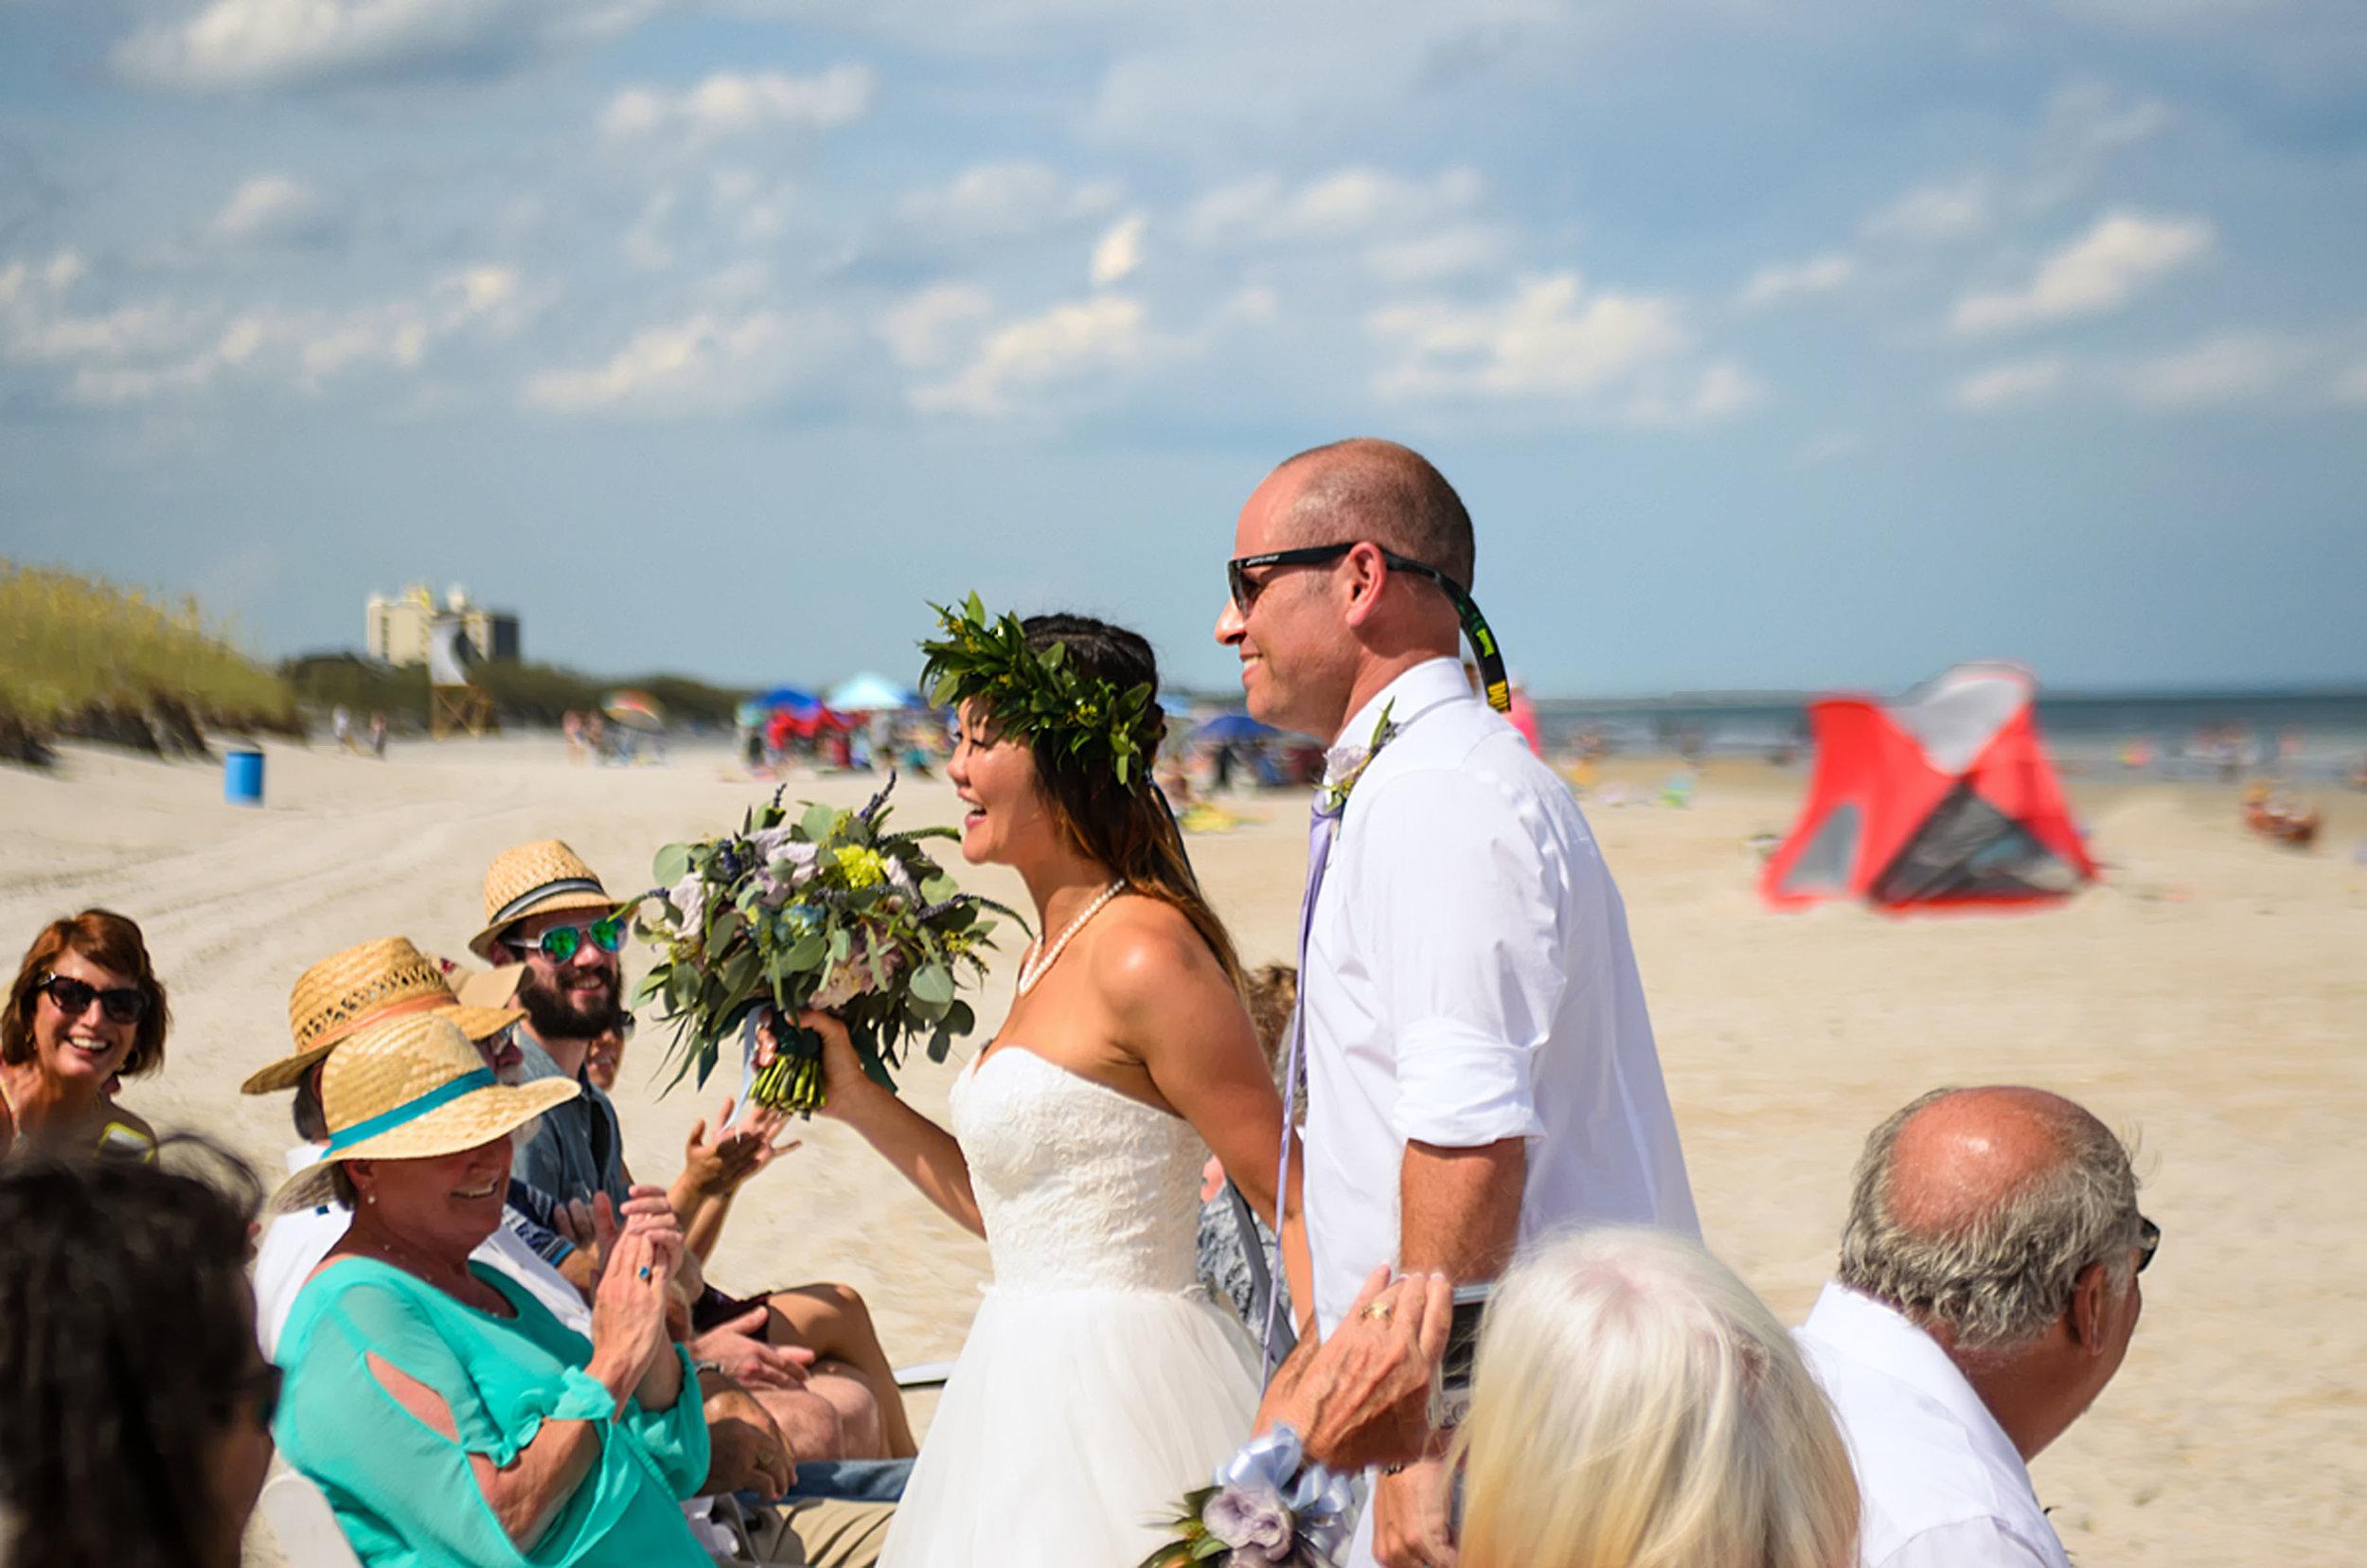 North_Carolina_Wedding_Photographer_Tiffany_Abruzzo_Ceremony_076.jpg